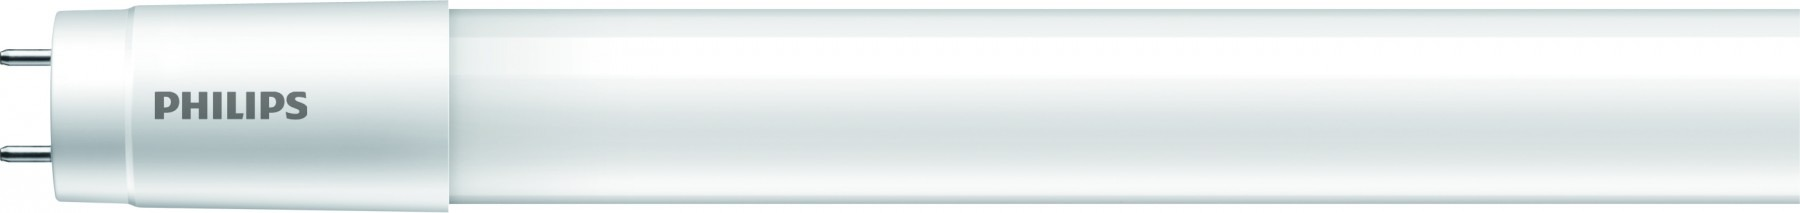 Philips CorePro LED tube 150 cm Röhre 20 Watt 2.000 Lumen Lichtfarbe wählbar